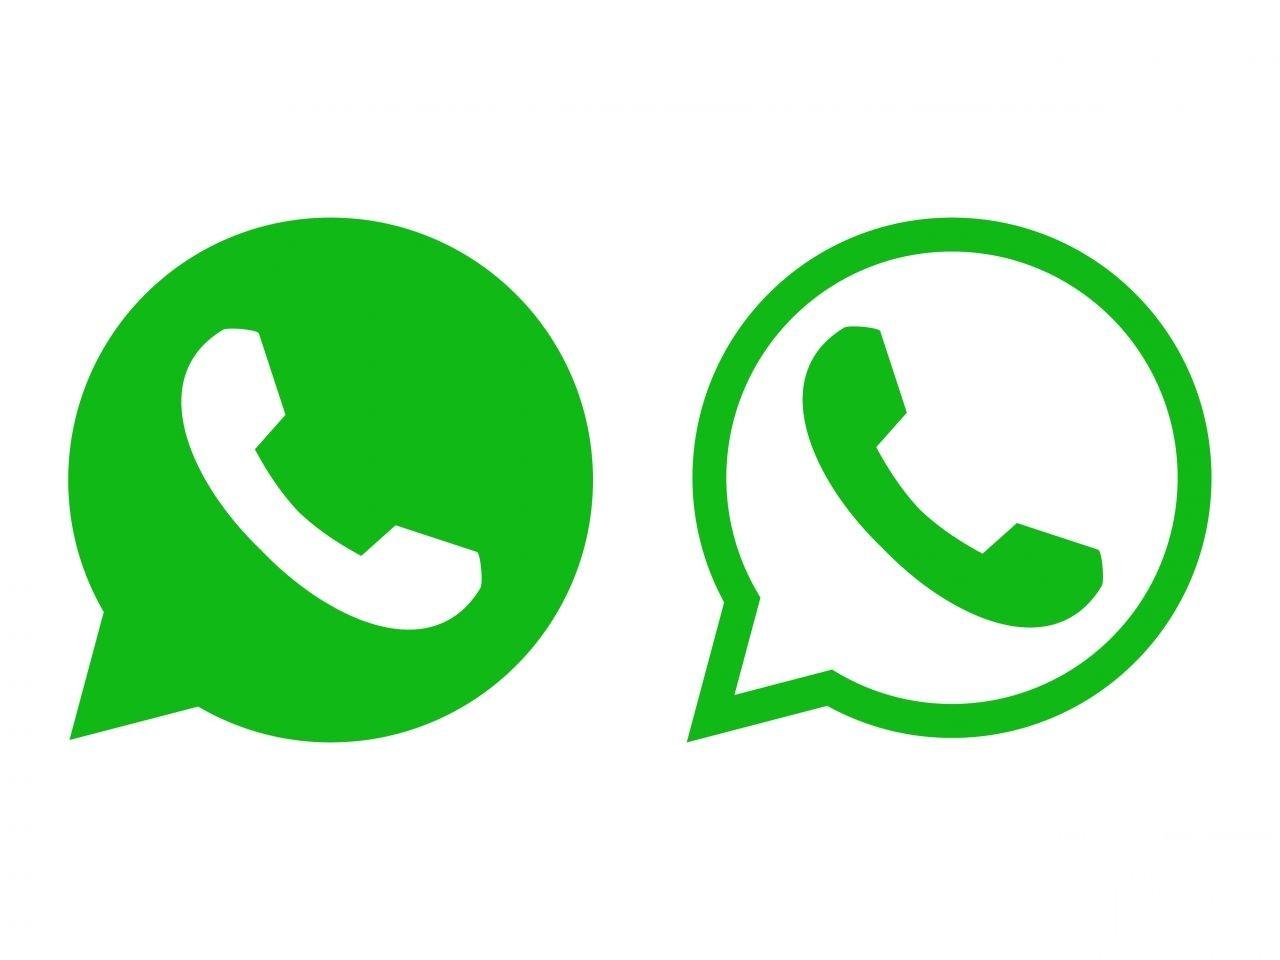 WhatsApp限制訊息只能轉發5次